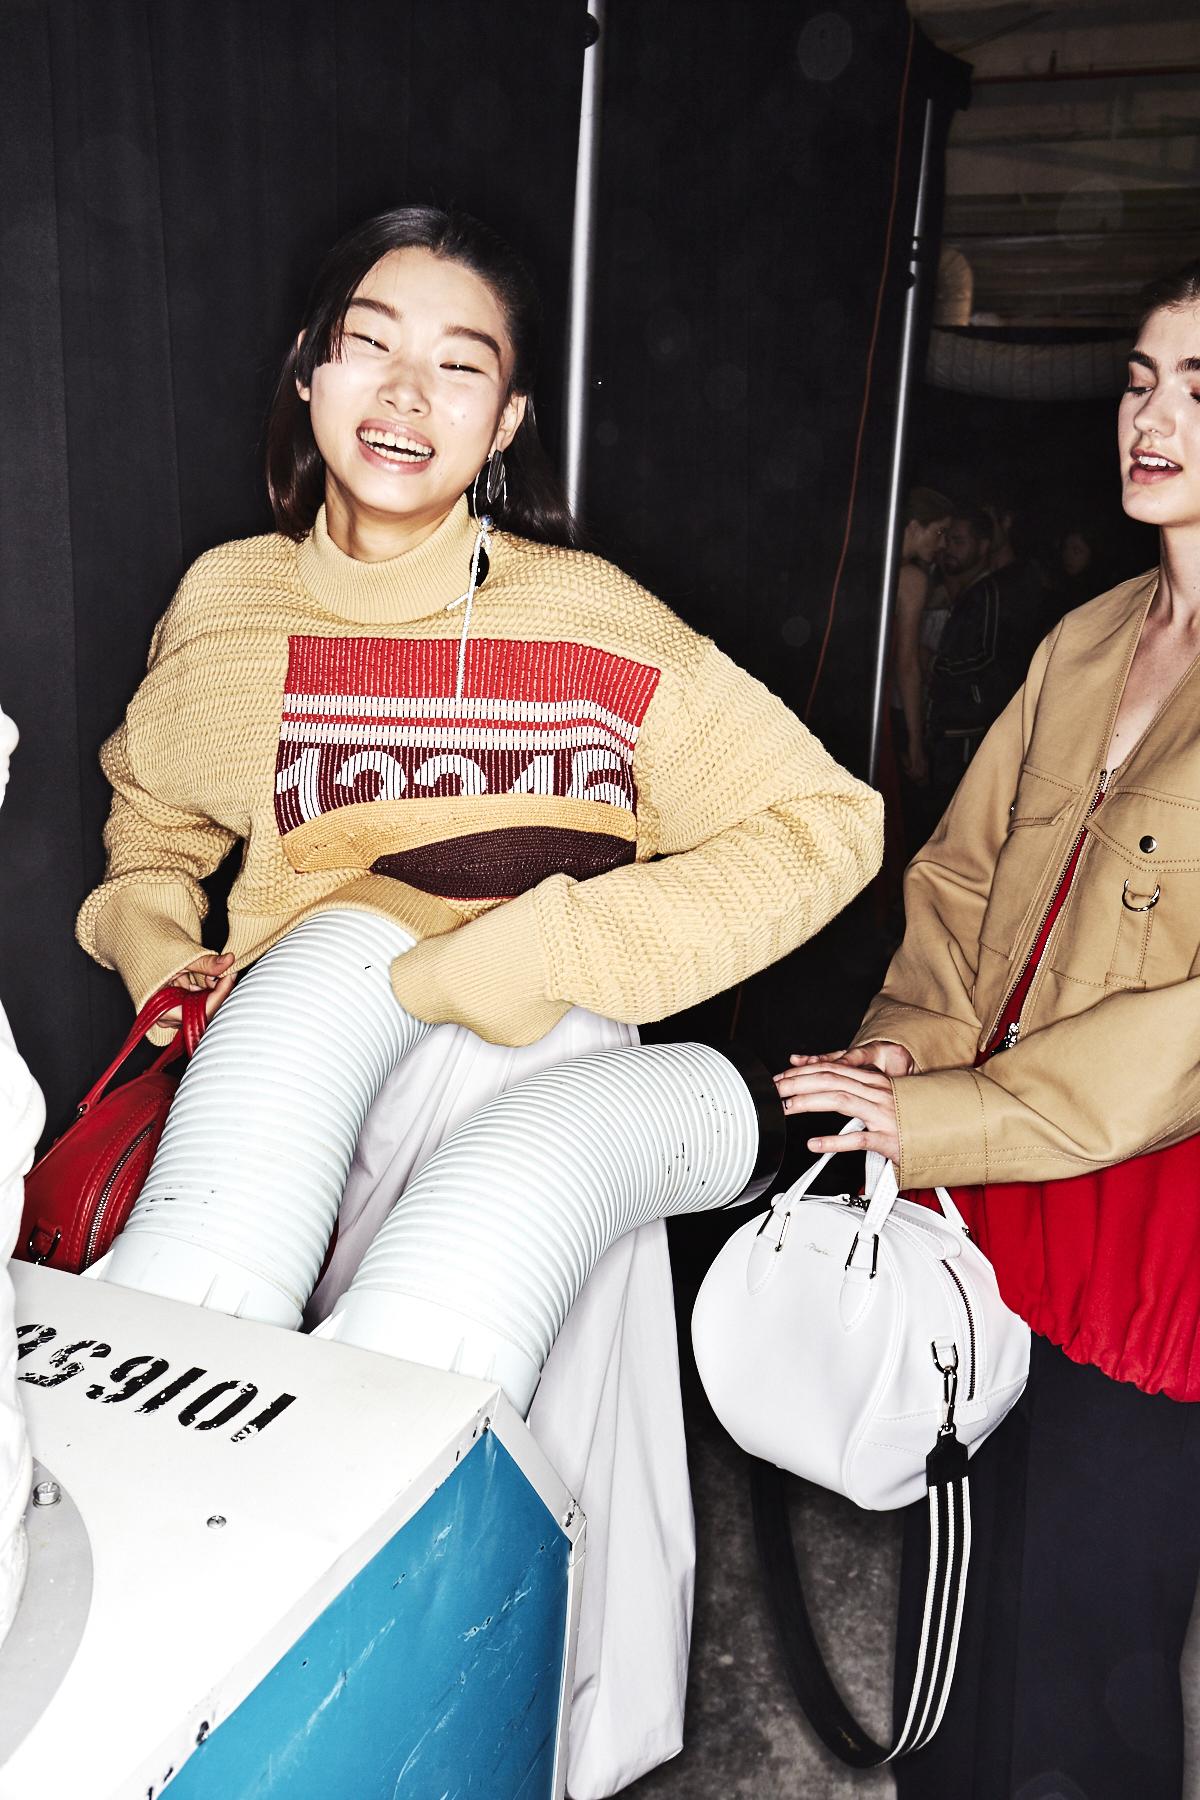 3.1 Phillip Lim SS18 Fashion Show New York Backstage